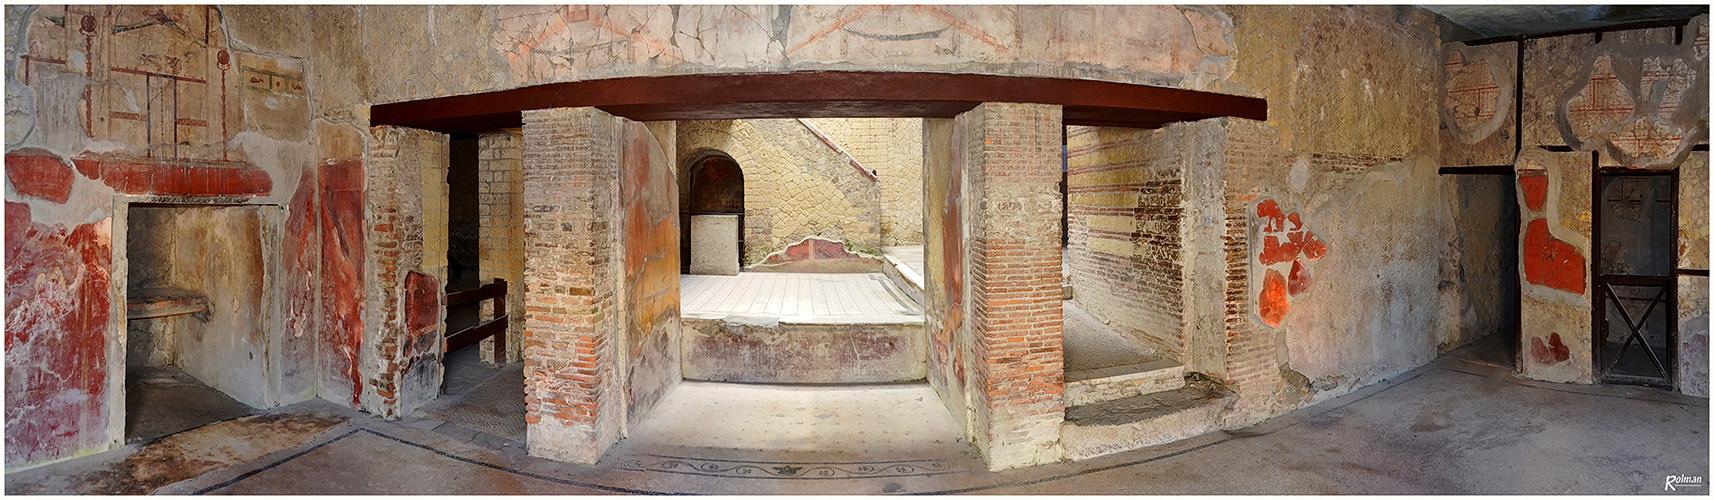 Ausgrabung Herculaneum  in Neapel